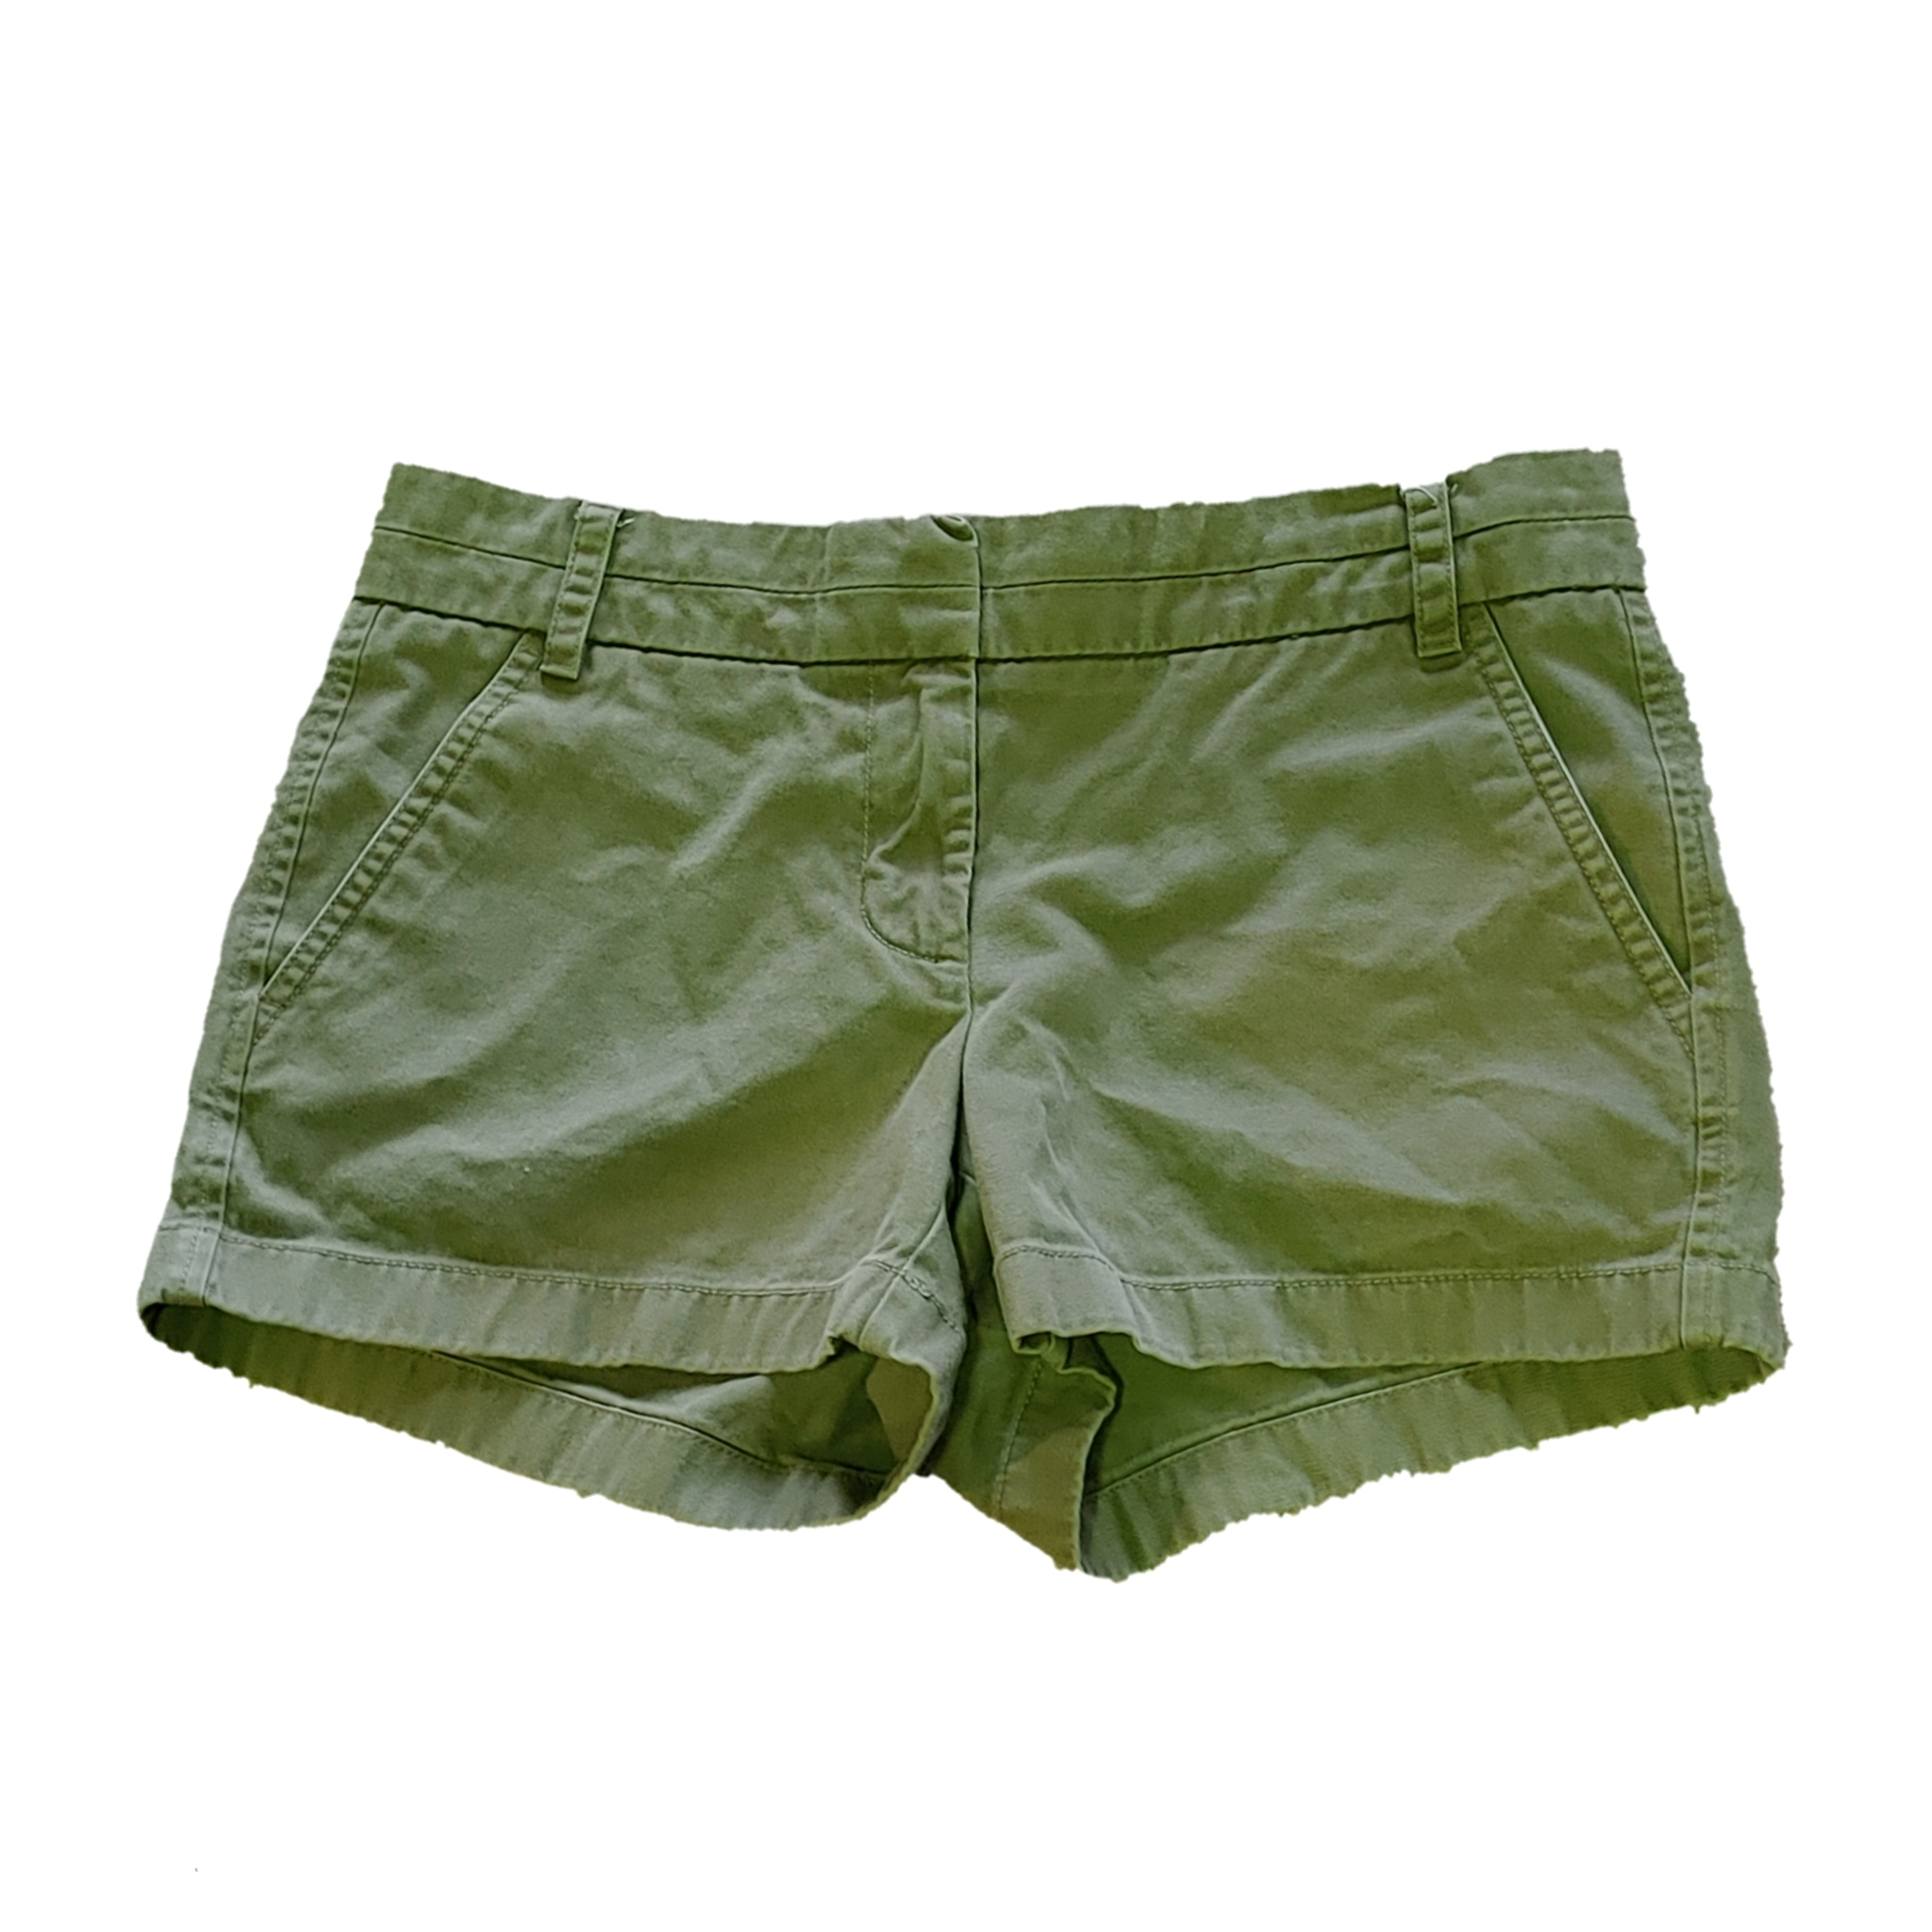 J.CREW【USED】Chino Short Pants